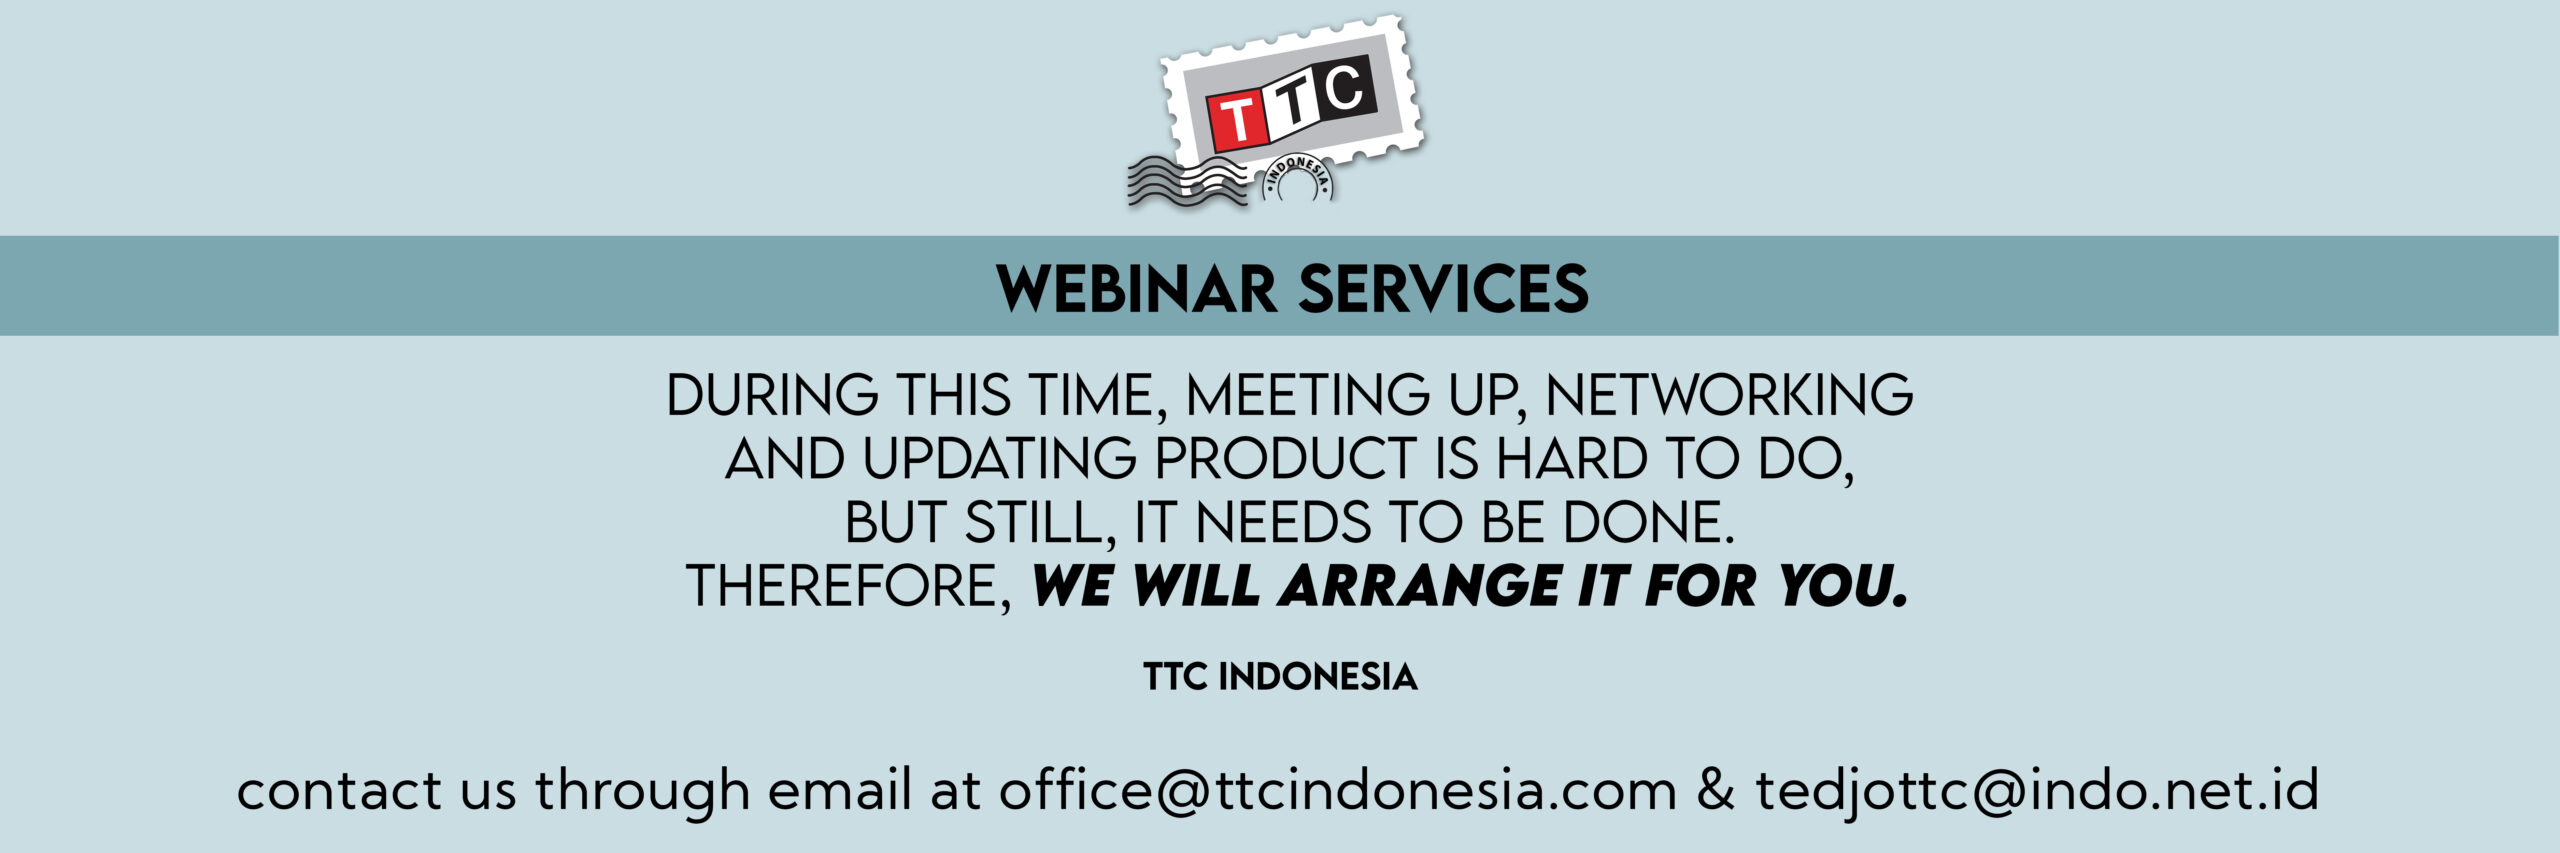 Webinar services (1)